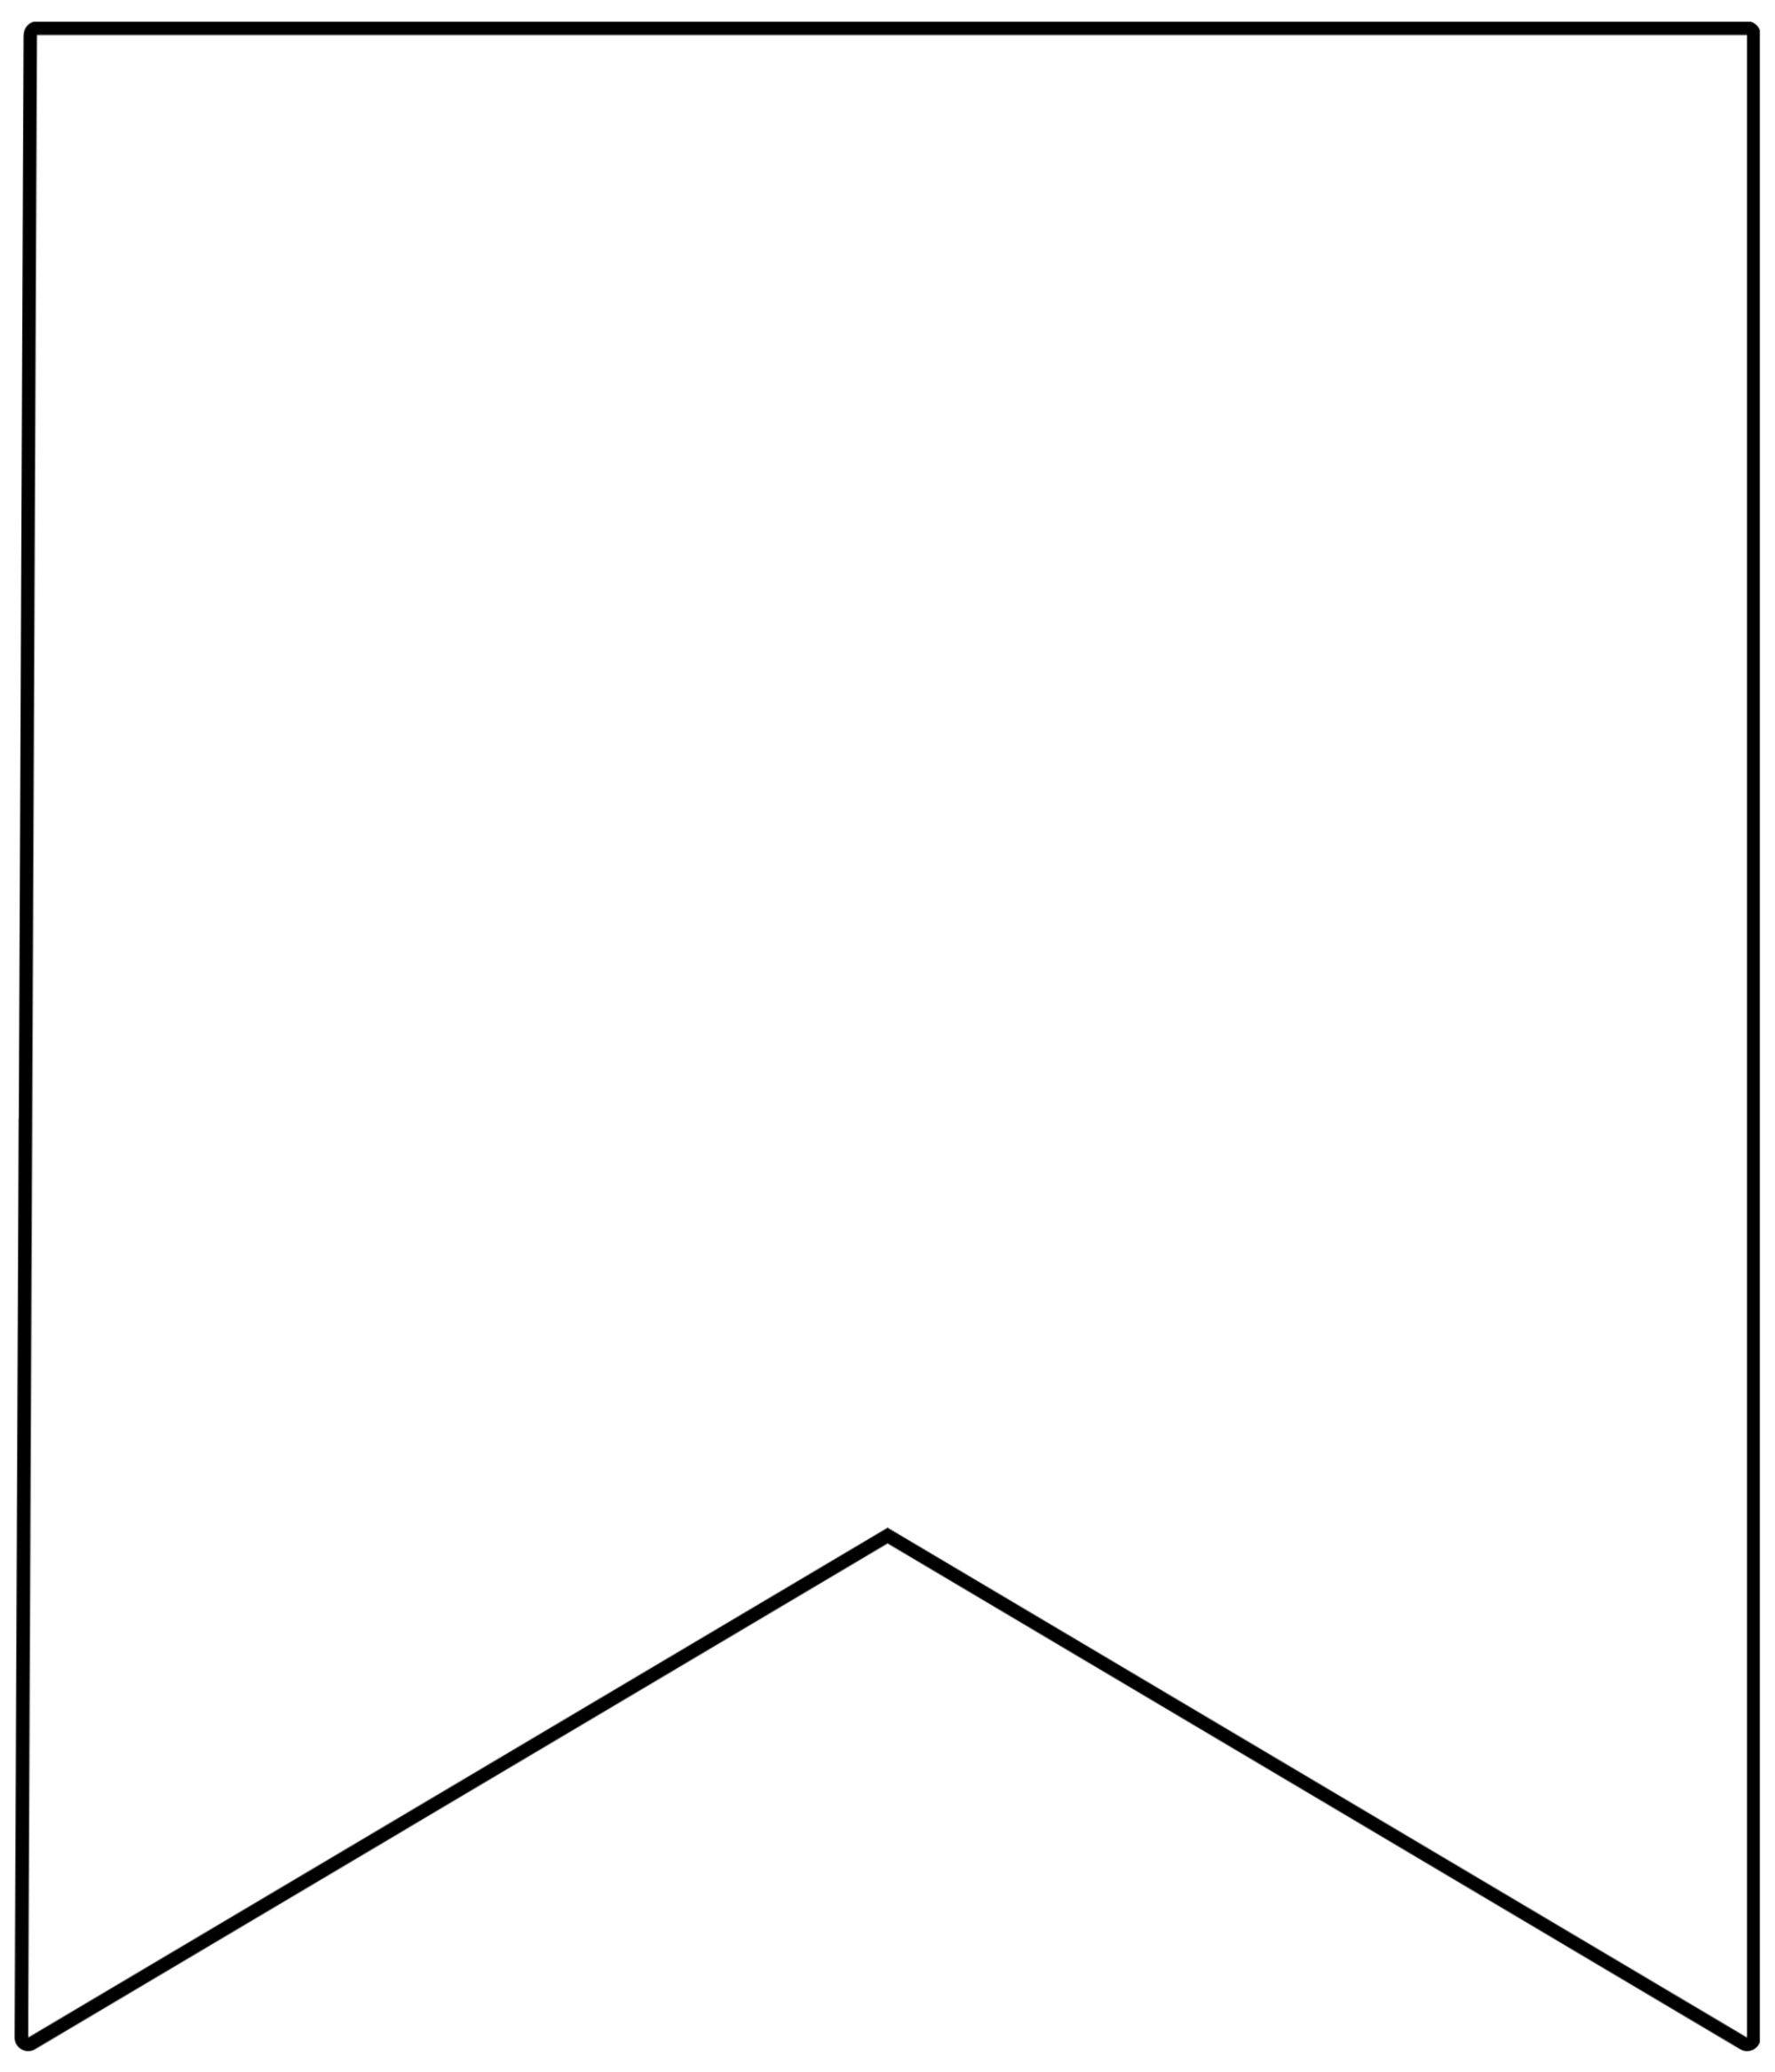 Free Printable Banner Templates Blank Banners Printable Banner